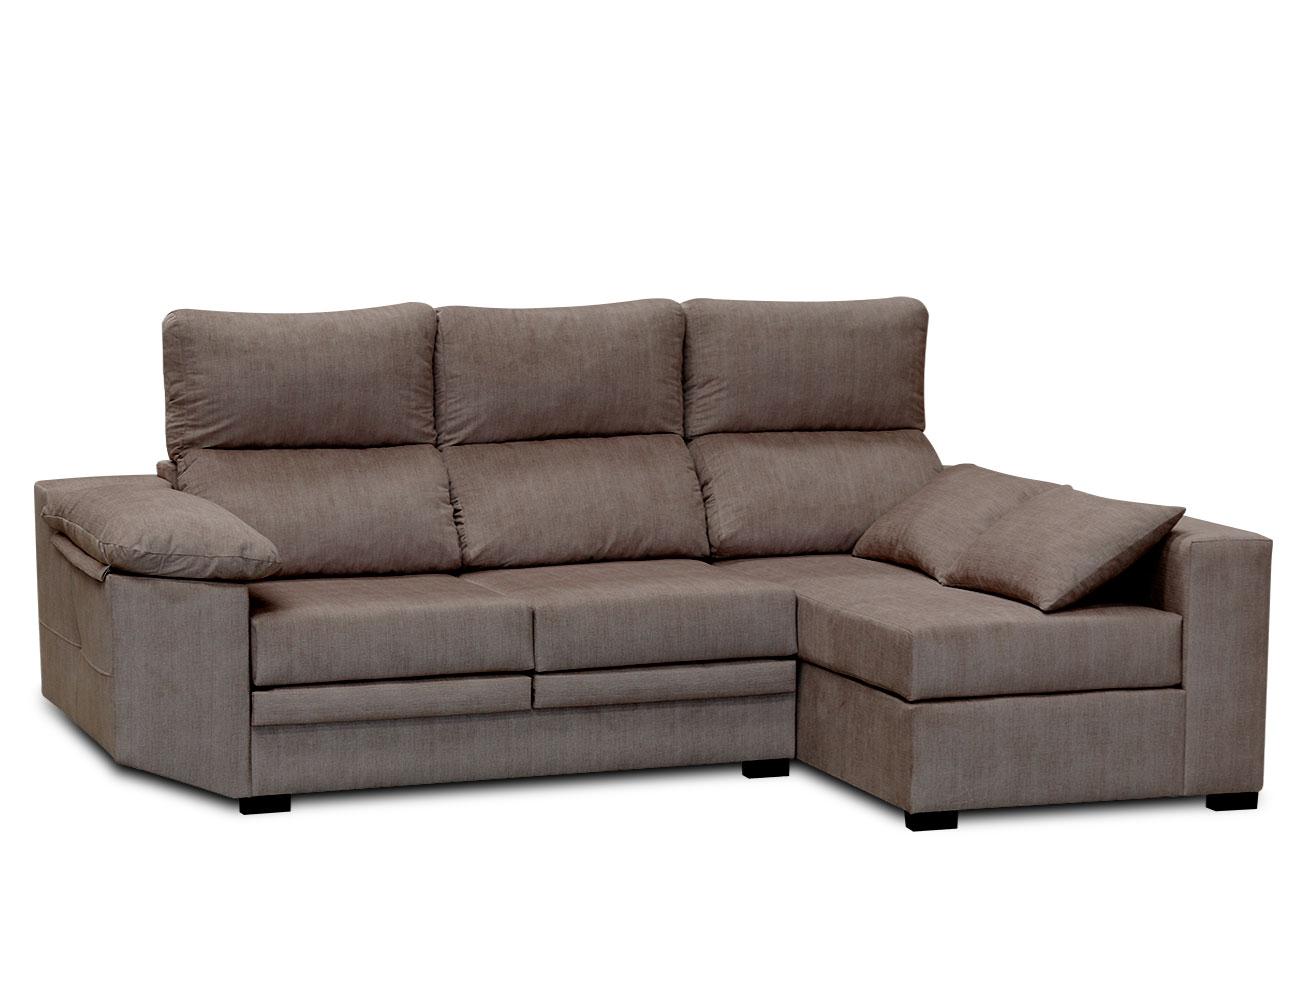 Sofa chaiselongue moderno cojines moka 3